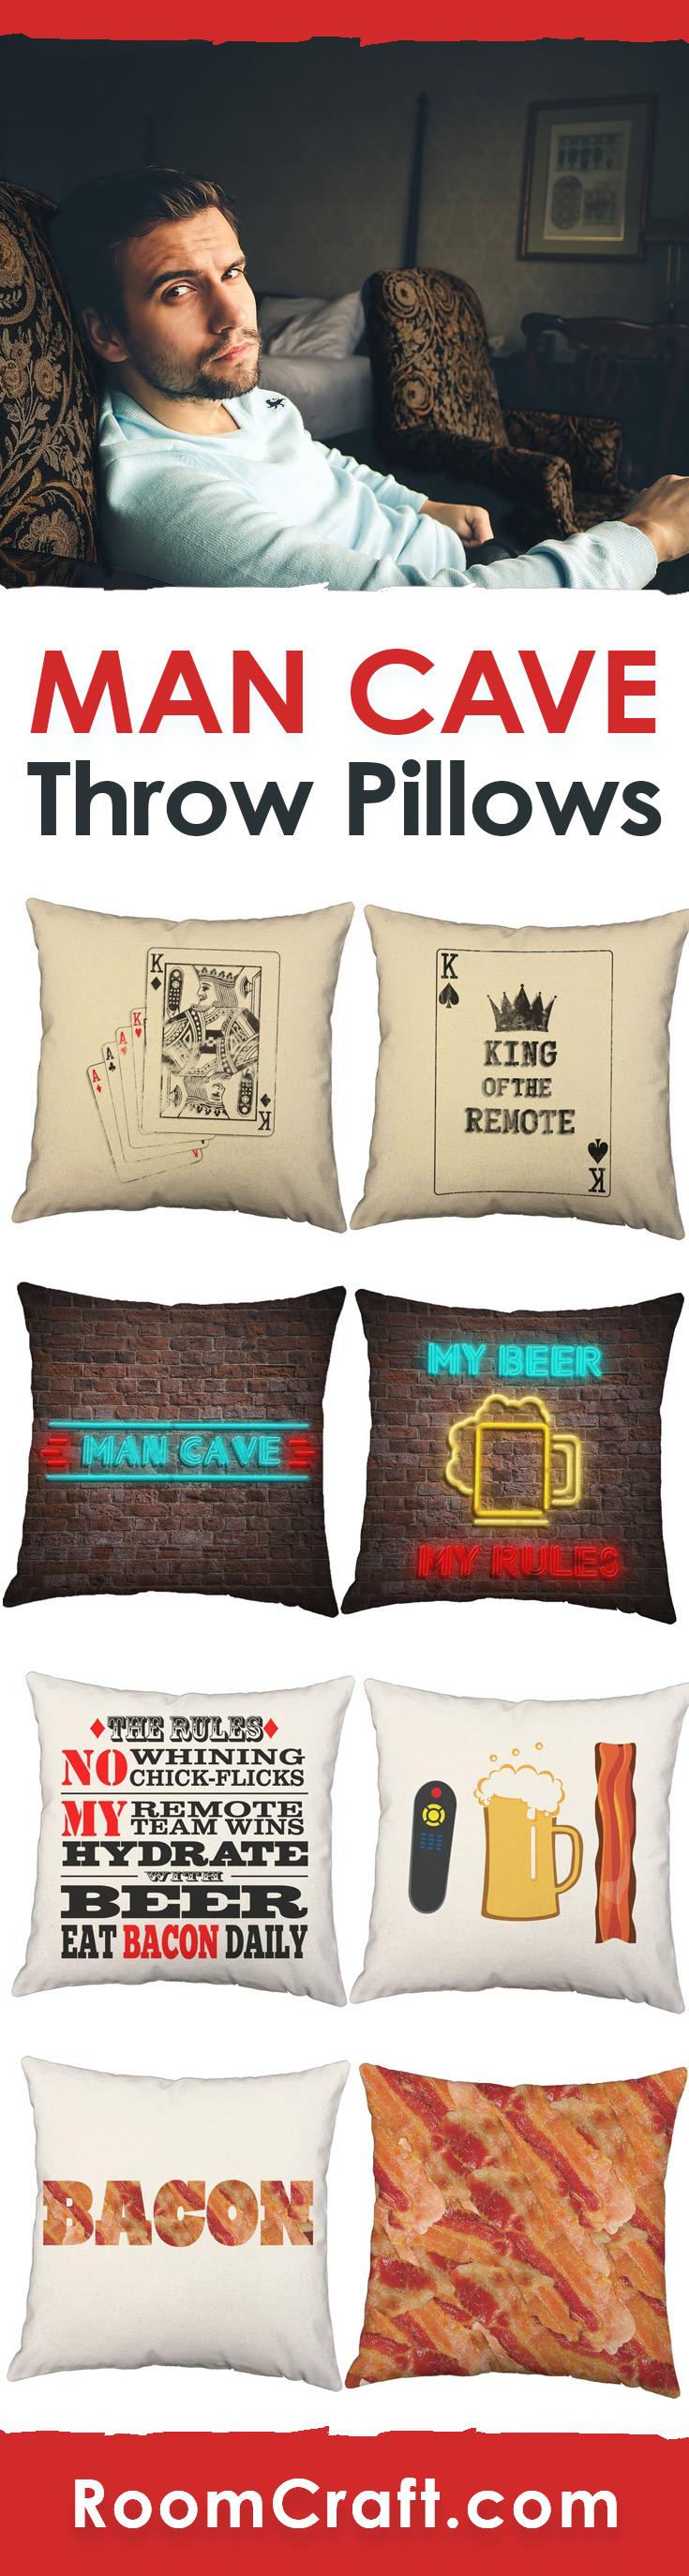 Man Cave Neon Beer Sign Throw Pillows | Men cave, Cave and Throw pillows